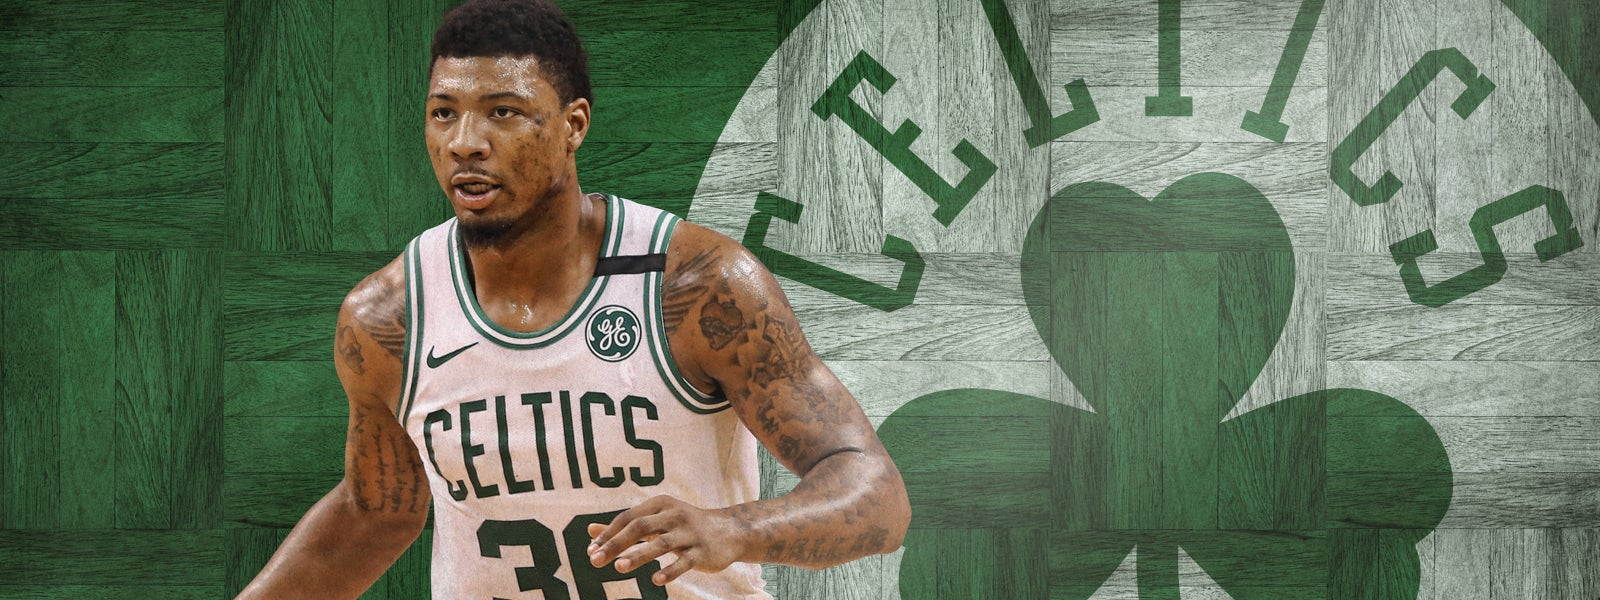 Celtics vs. 76ers